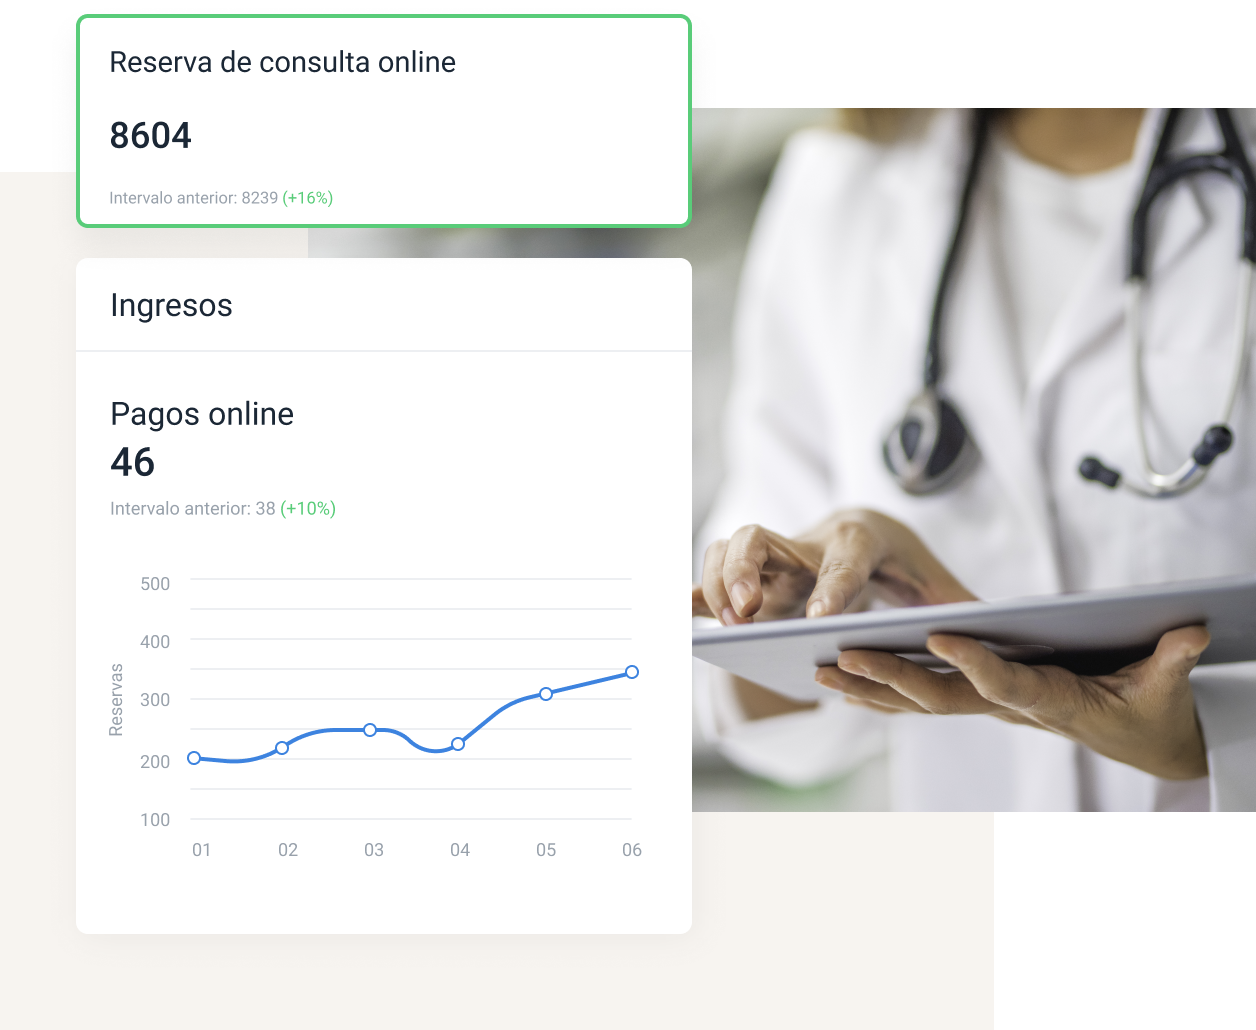 es-online-consultation-fzone-tt-lp-data@2x